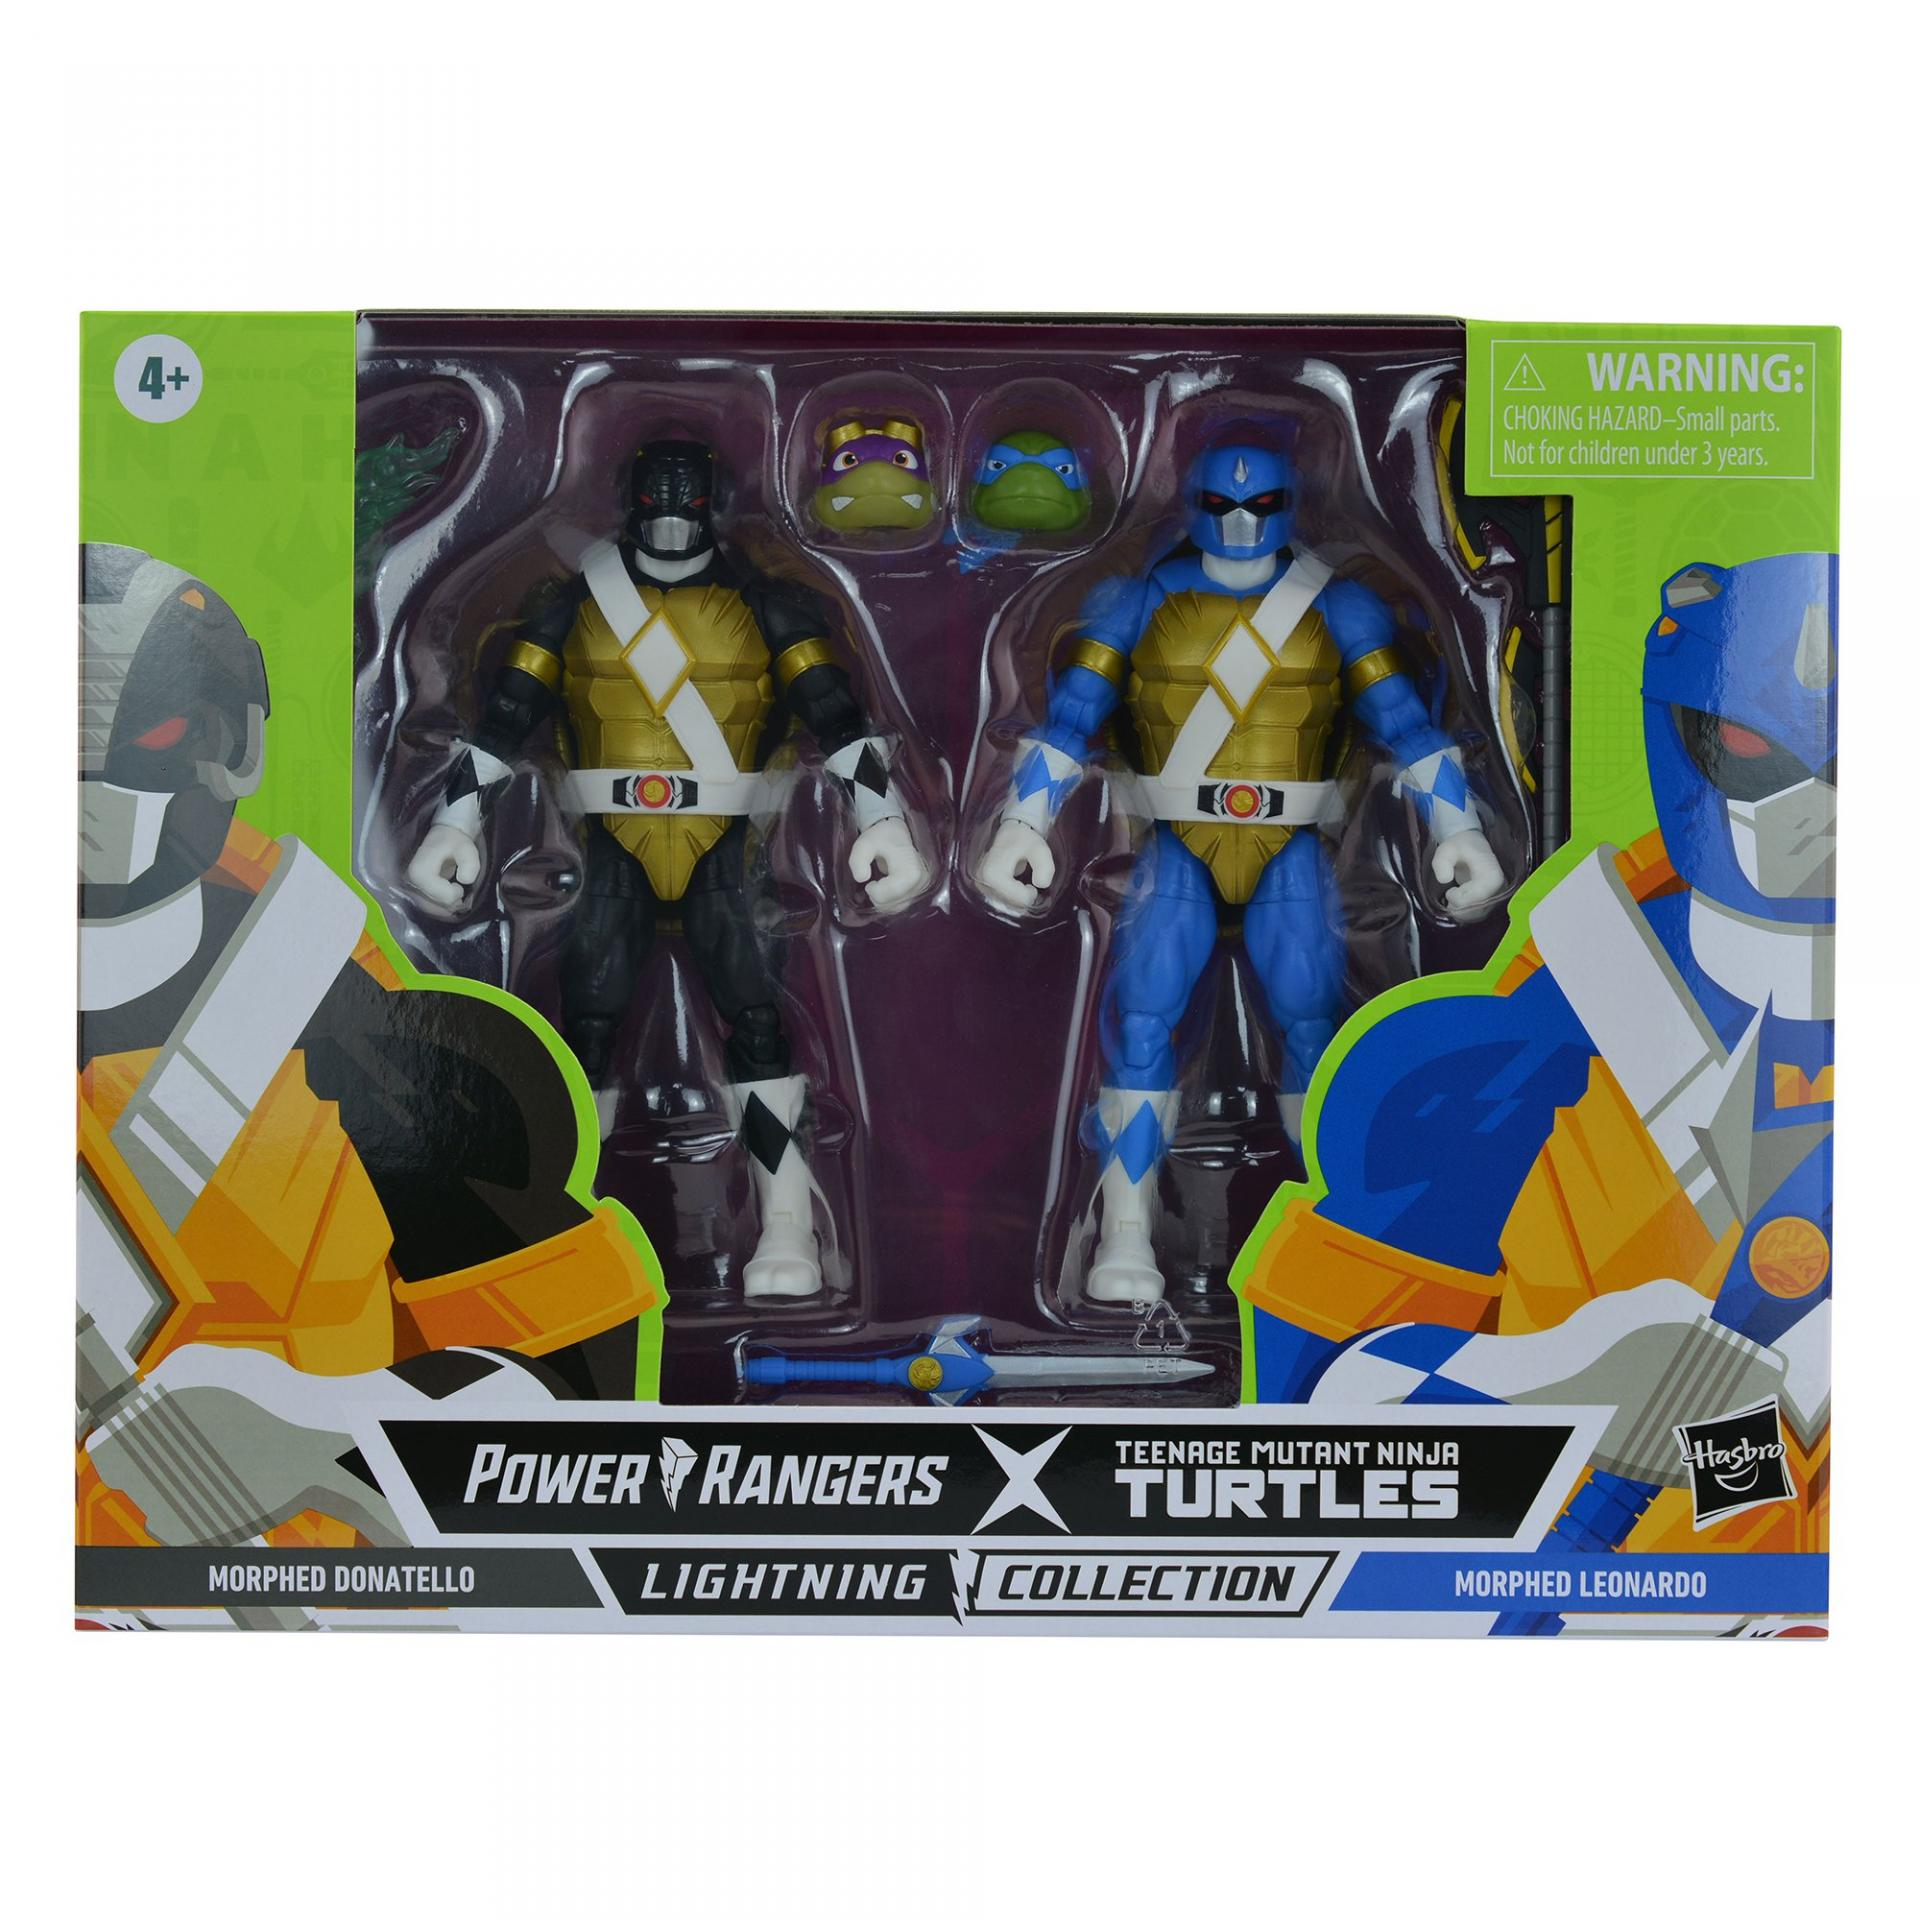 Power rangers tortue ninja tmnt lightning collection morphed donatello morphed leonardo 15cm